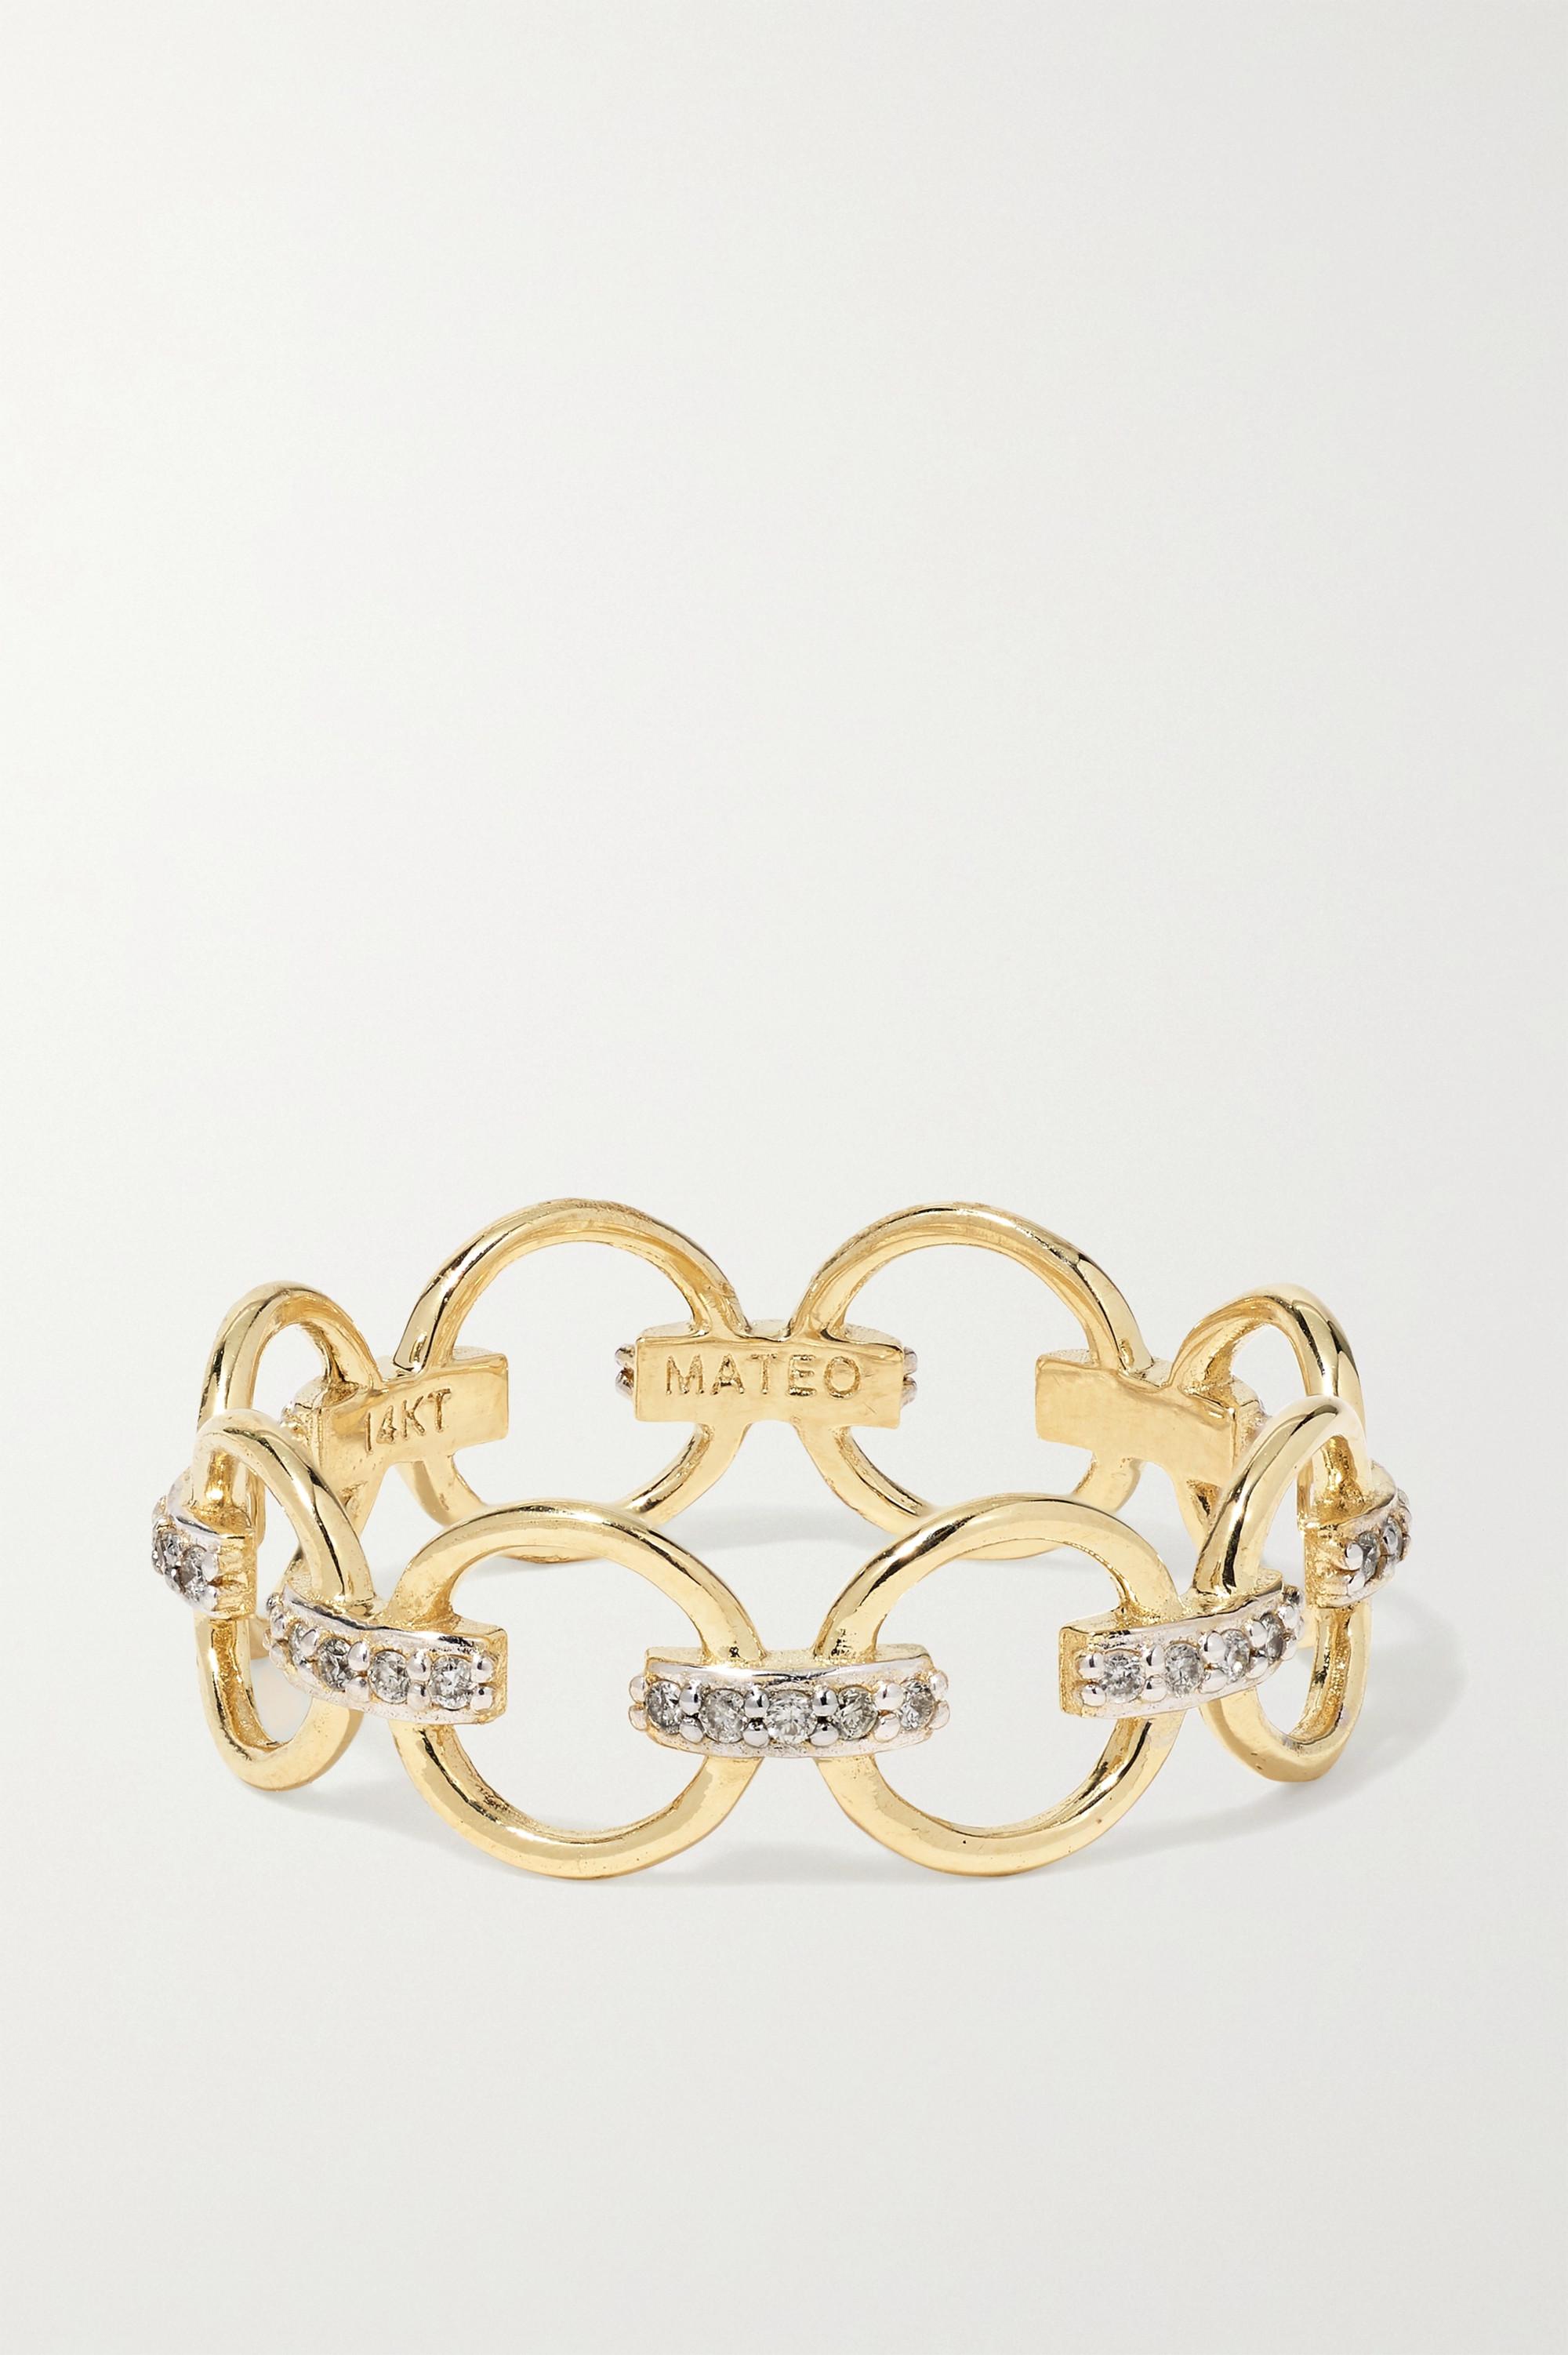 Mateo 14K 黄金钻石戒指